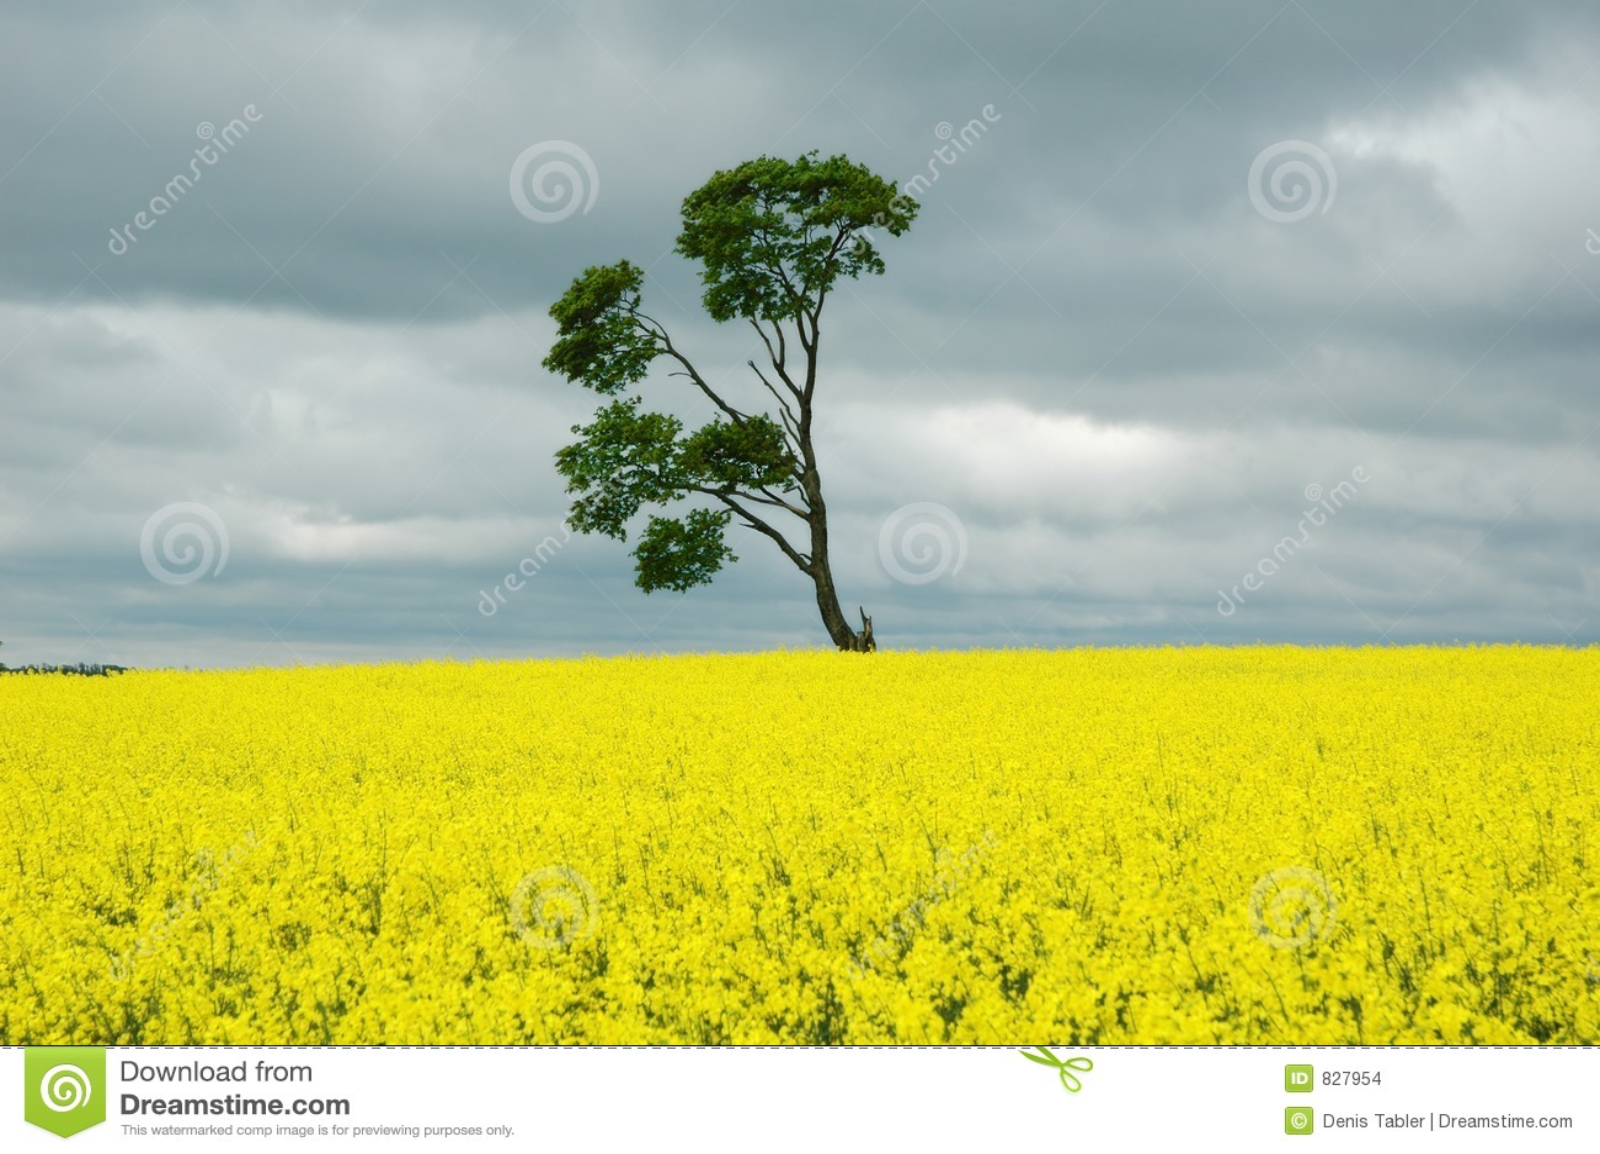 Tree on yellow